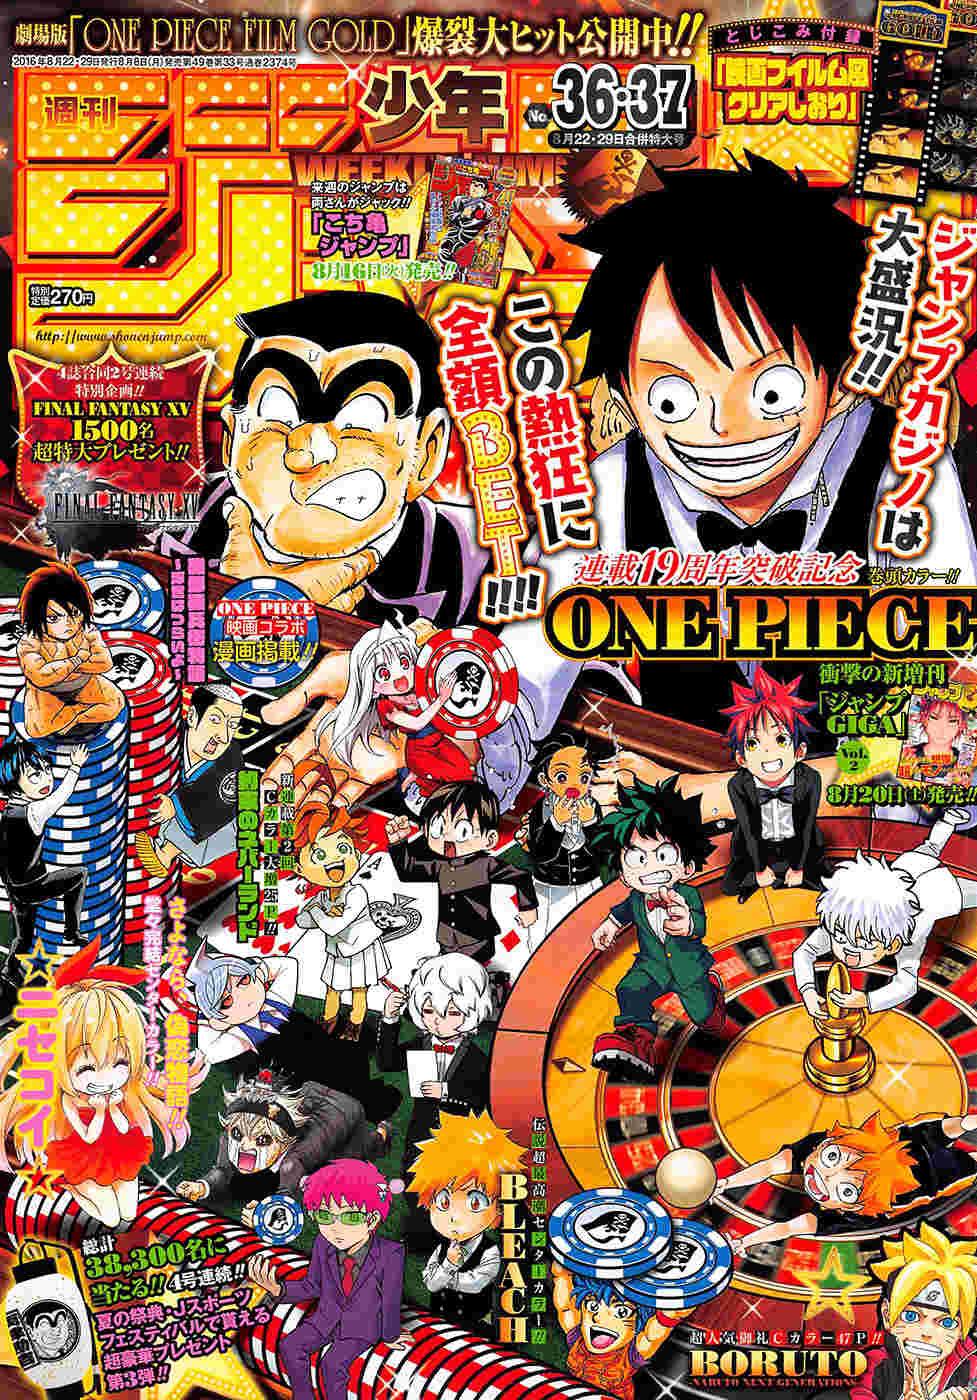 One Piece Chapter 835: Vương quốc Linh Hồn 00112